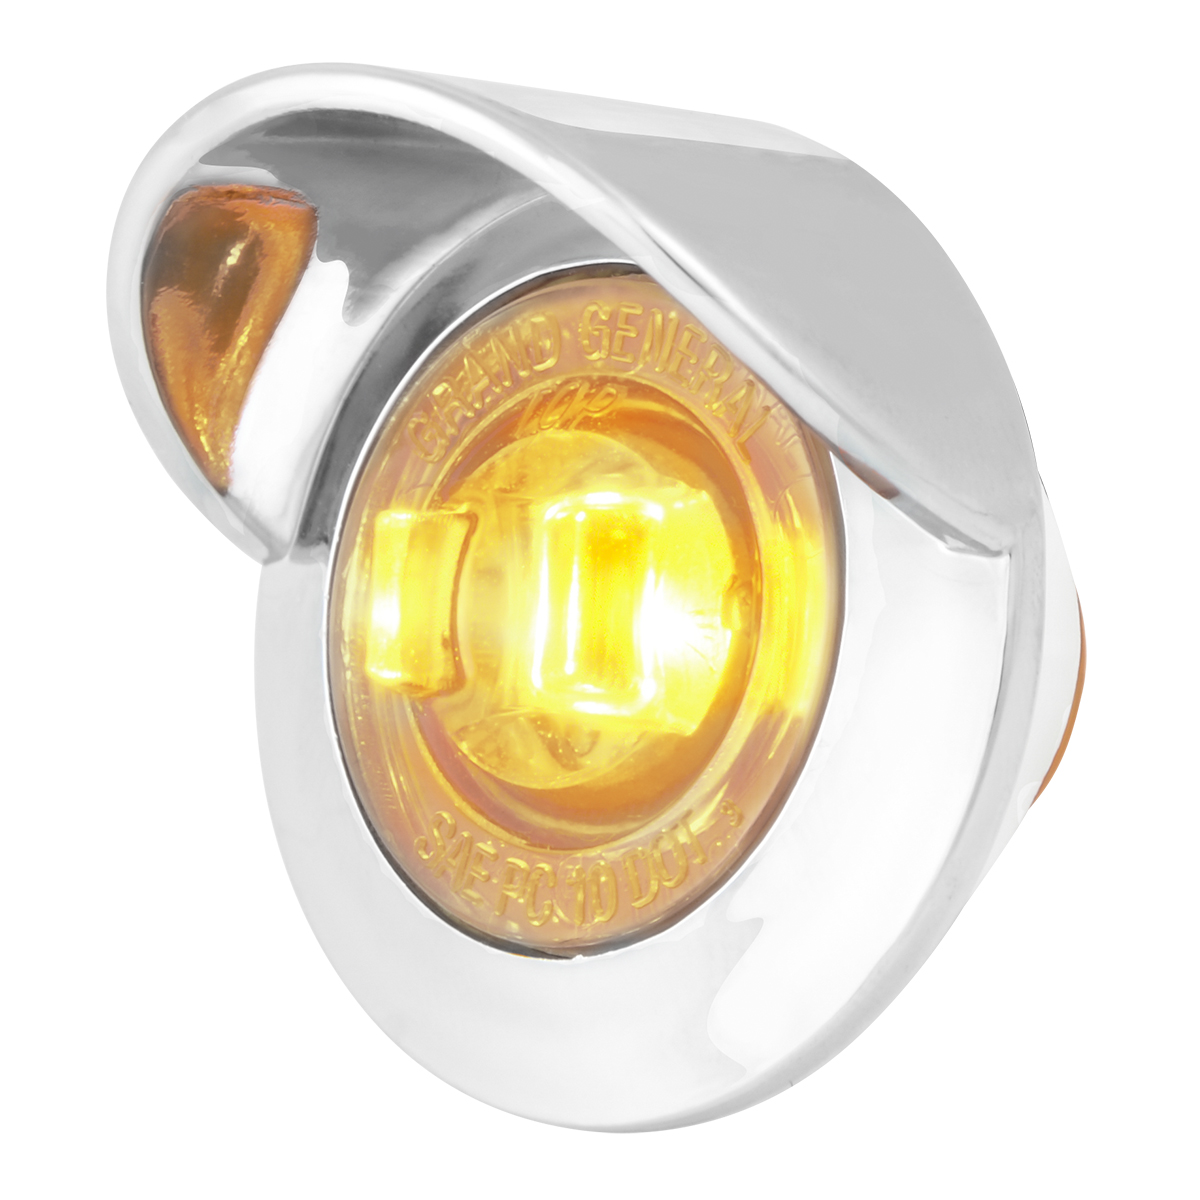 "75261 1"" Dual Function Mini Push/Screw-in Wide Angle LED Light w/ Chrome Bezel & Visor"